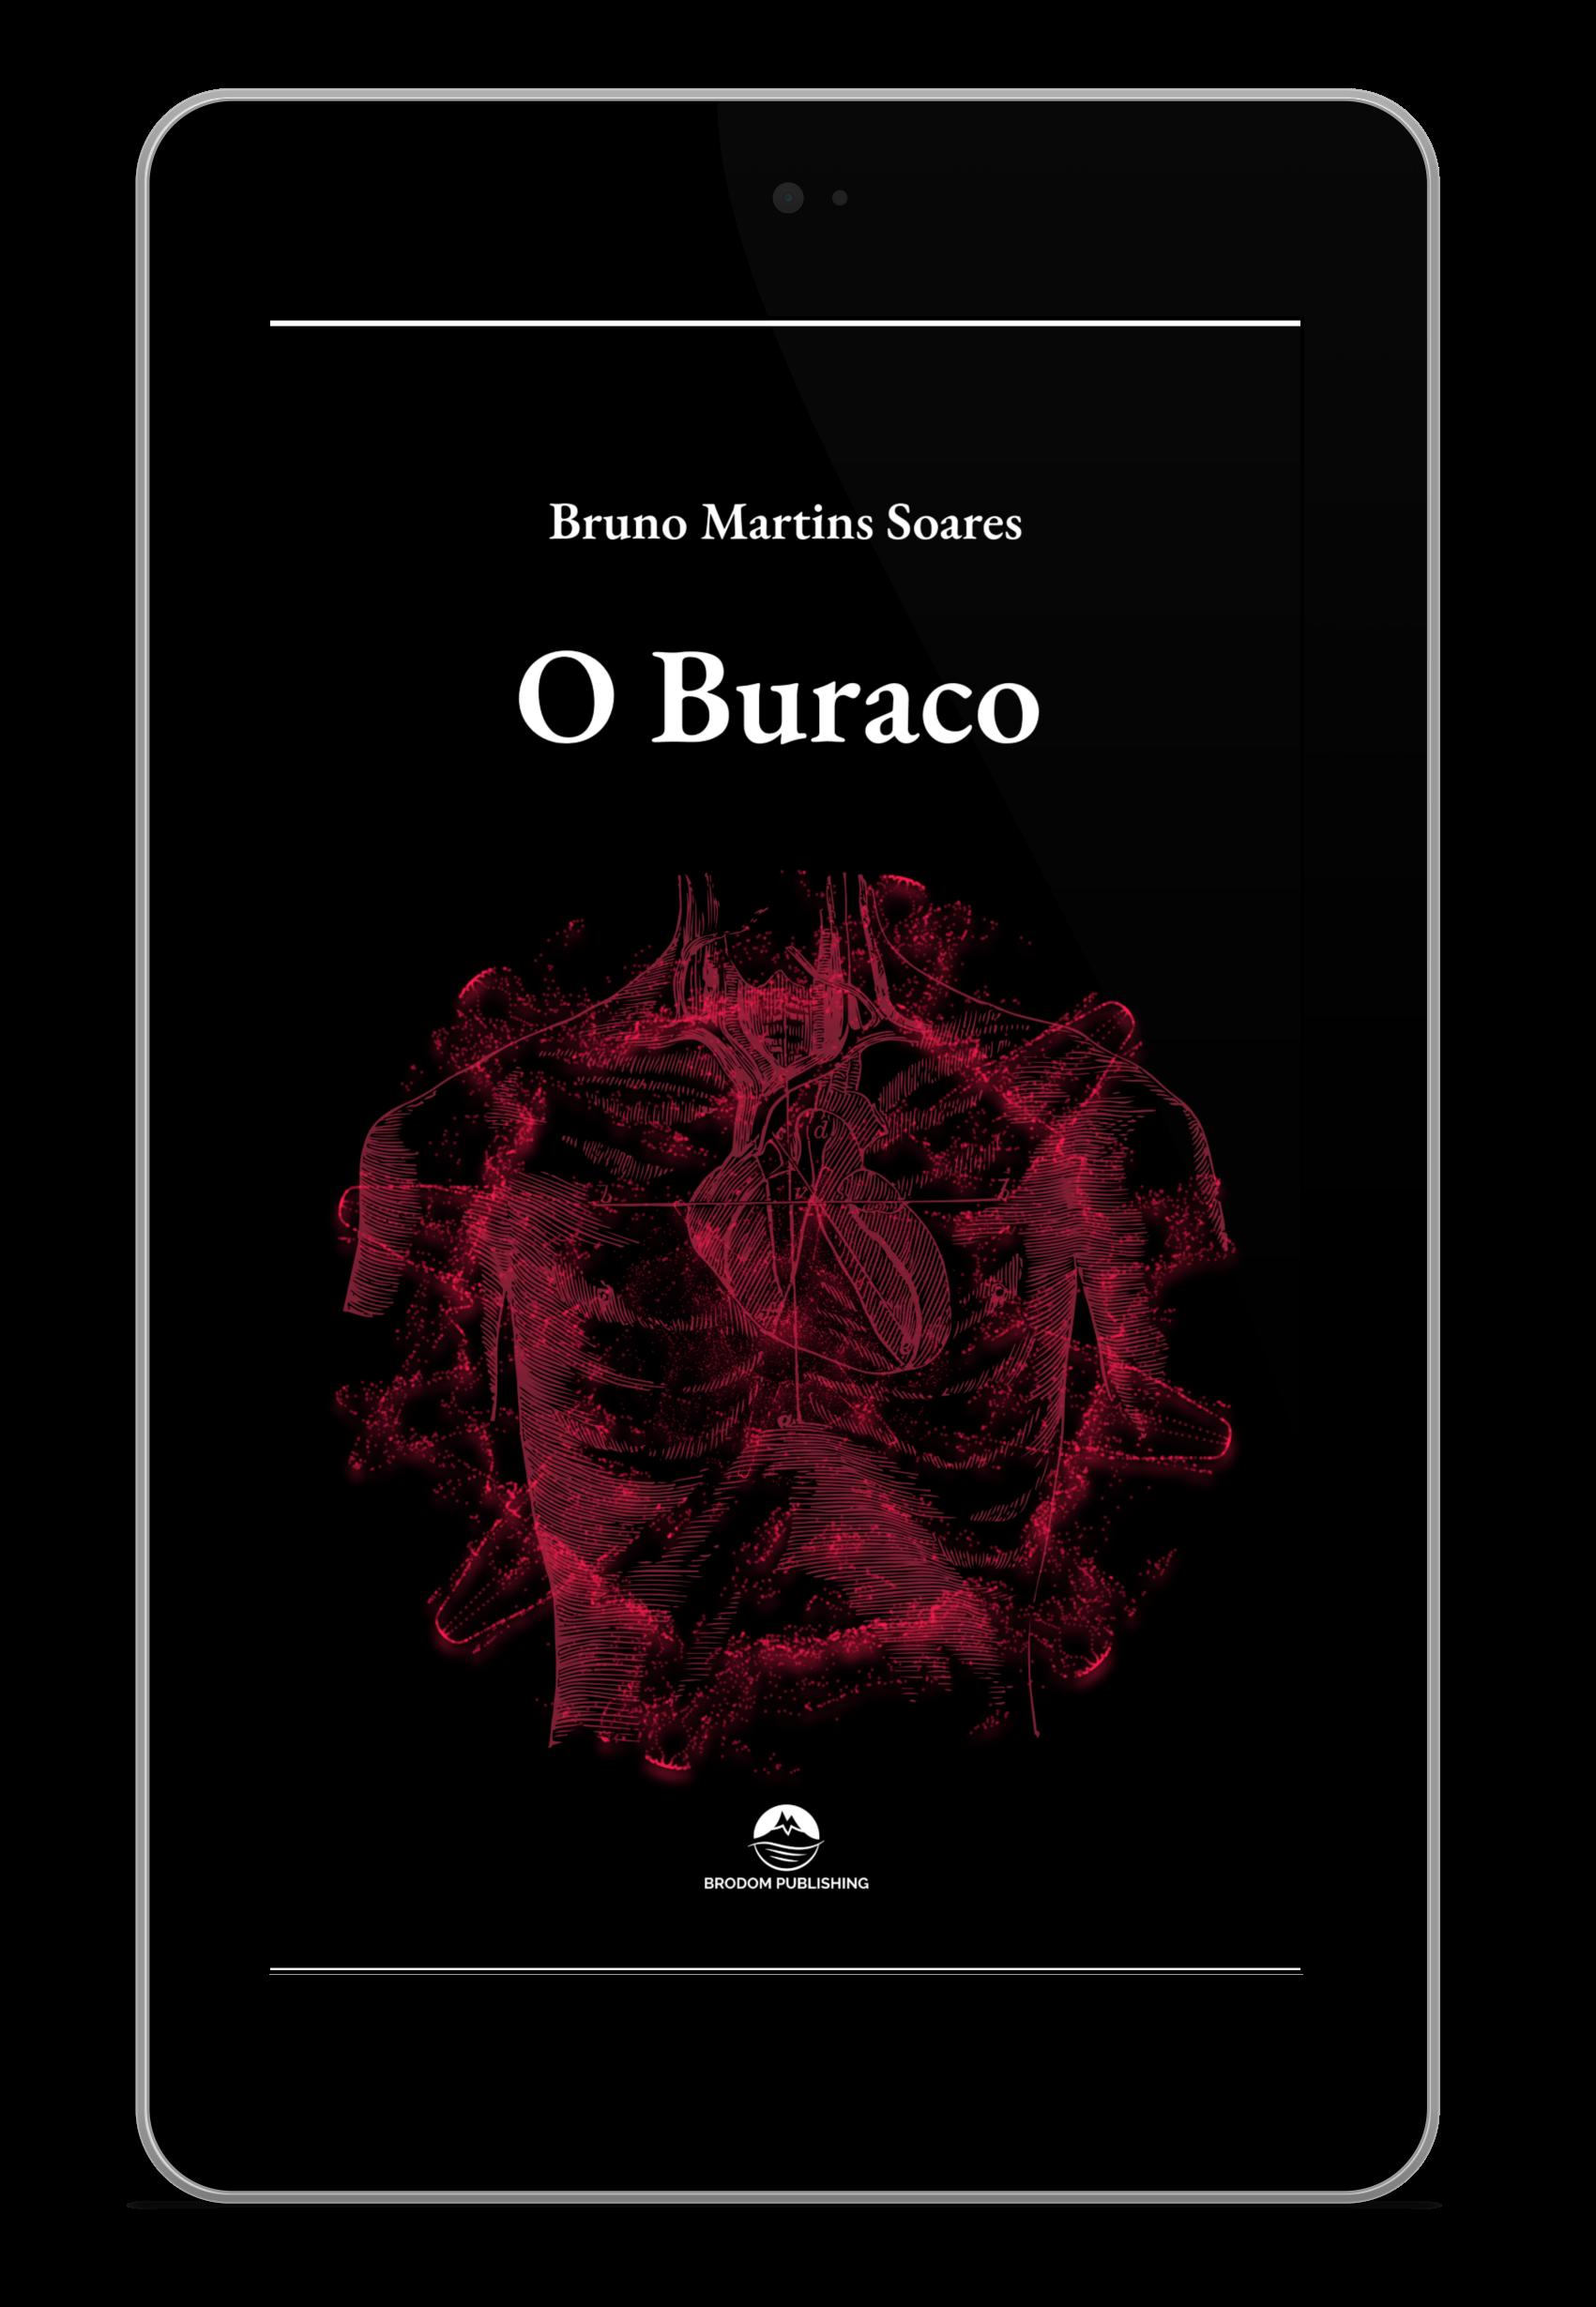 Buraco_google-nexus-7-white-background_Crop